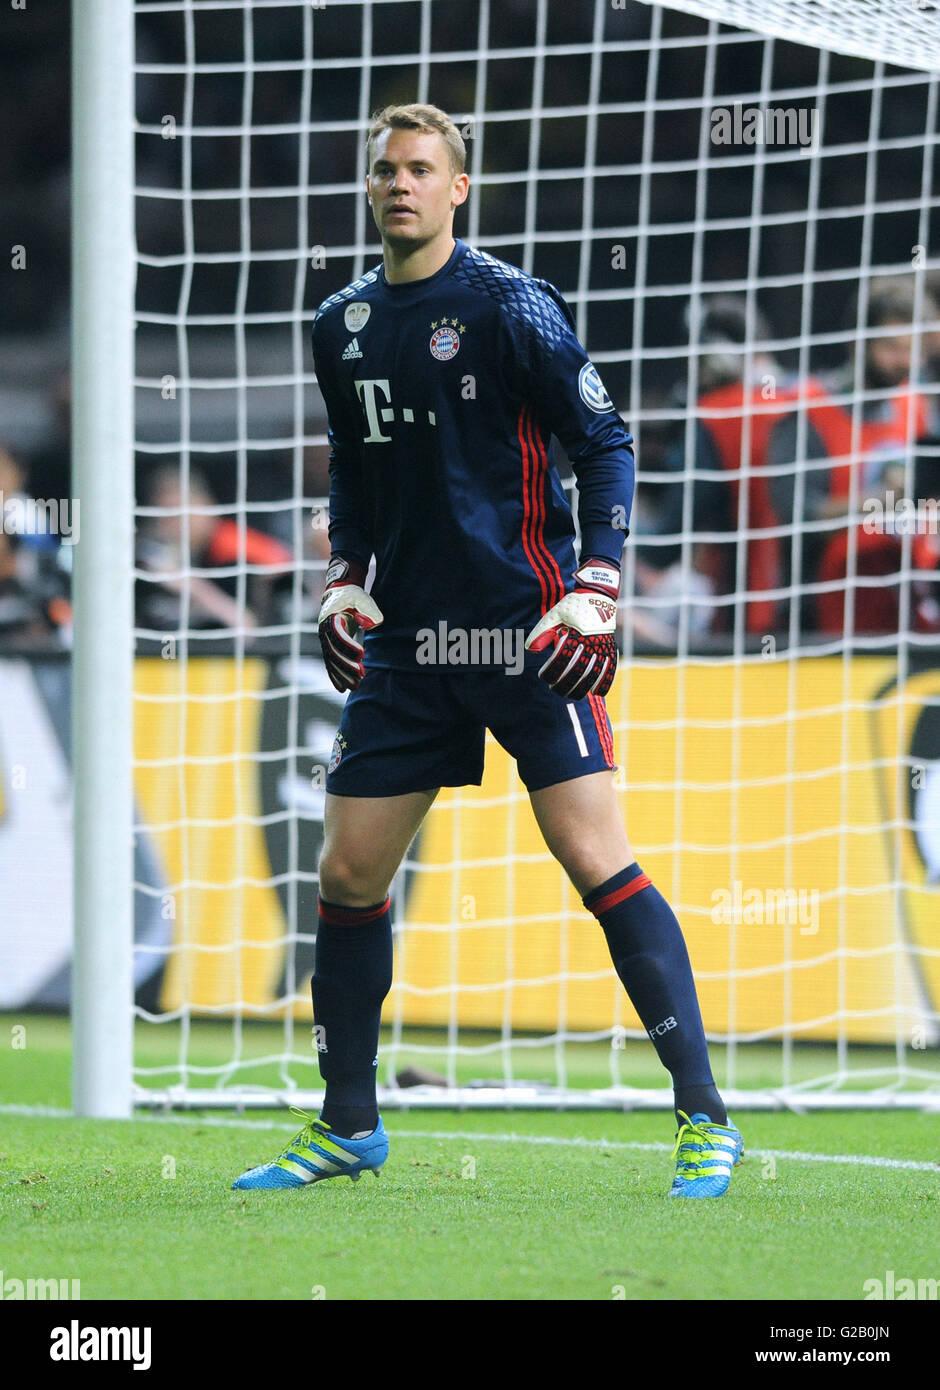 German Cup Final at Olympic Stadium Berlin, FC Bayern Munich vs Borussia Dortmund: Manuel Neuer of Munich. - Stock Image